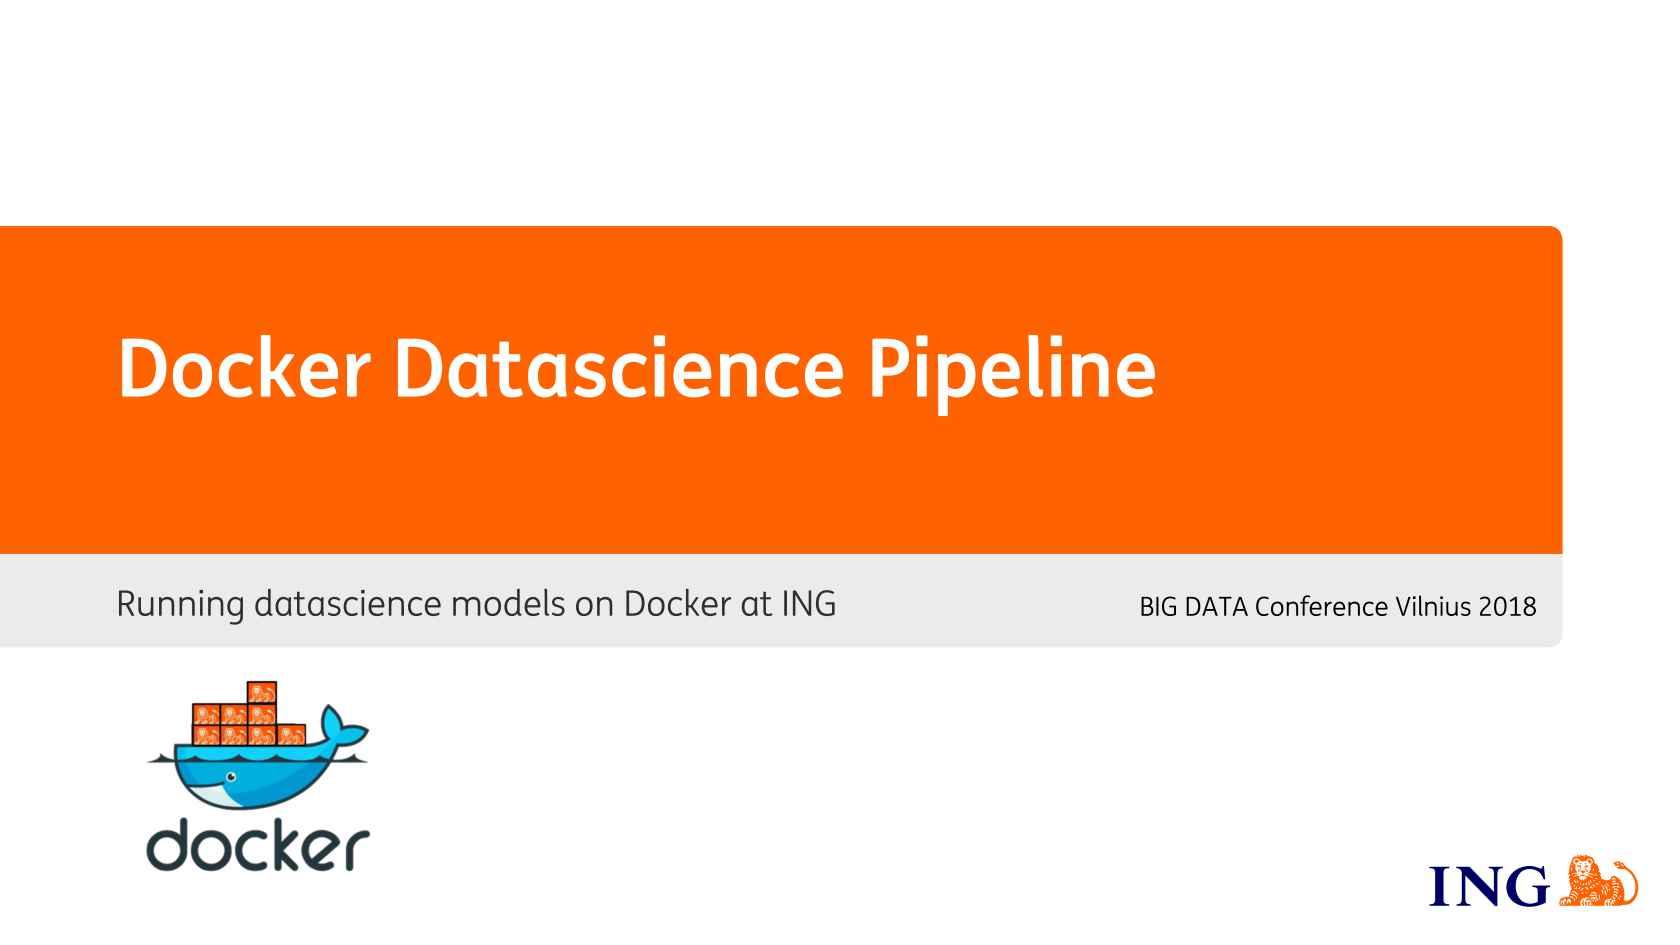 Docker Data Science Pipeline